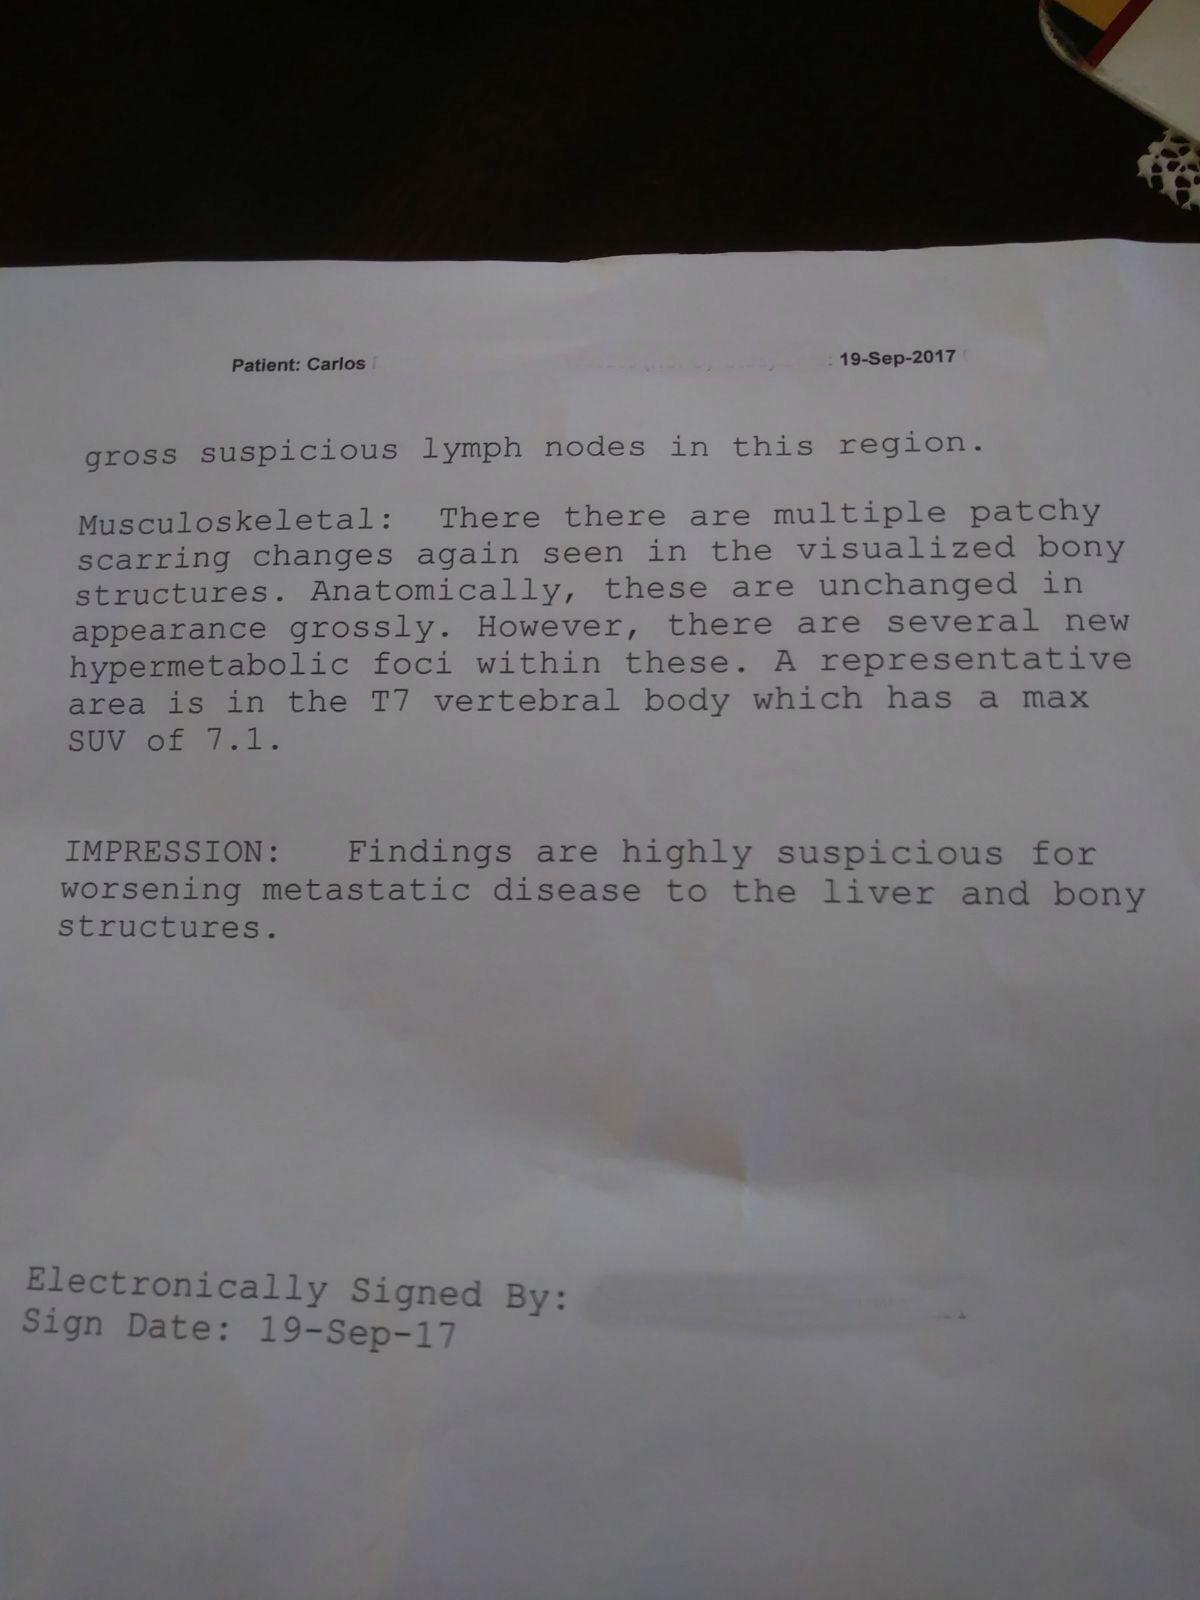 LifEscozul® - Carlos 8 - Cáncer de Pulmon